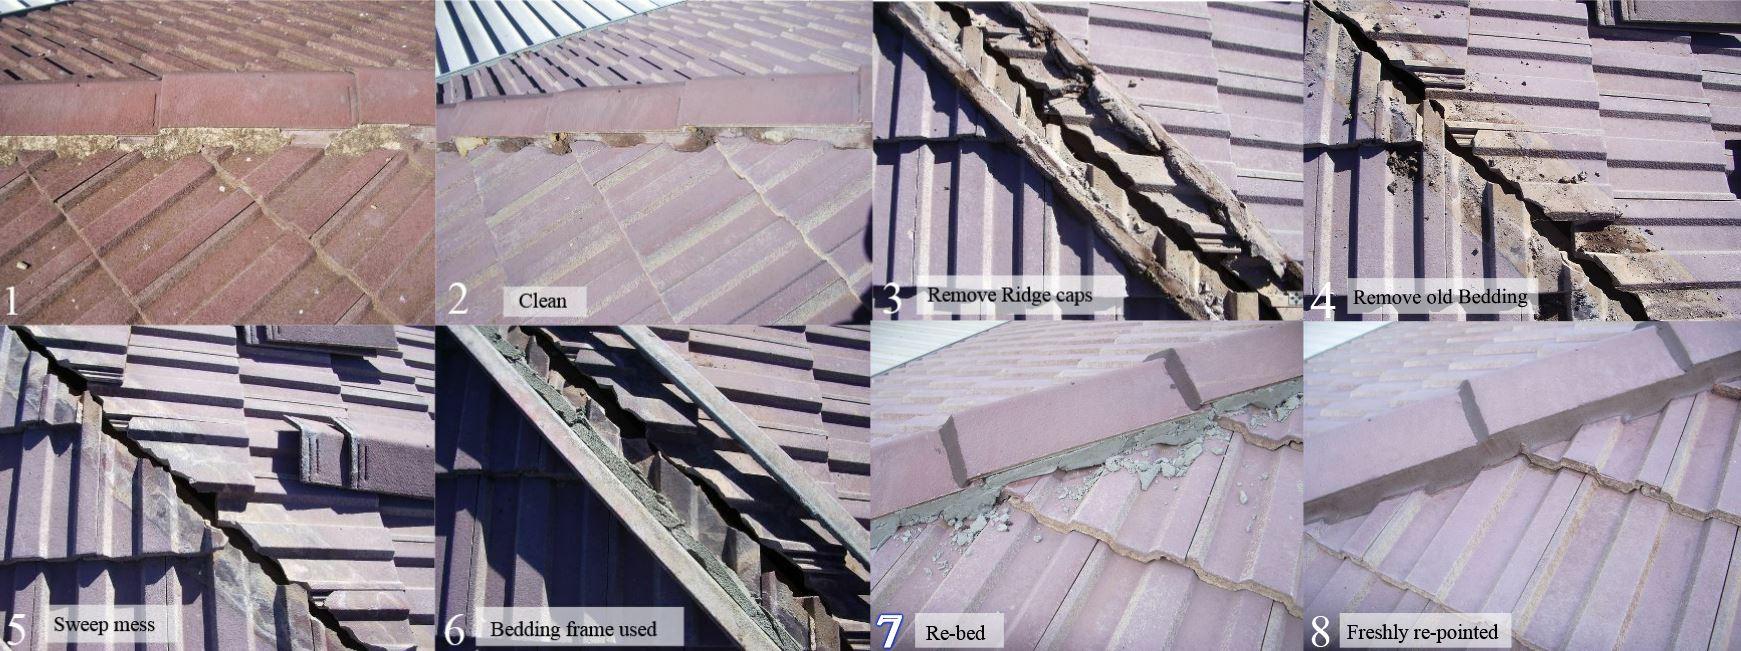 Roof Repairs Brisbane Roof Restorations